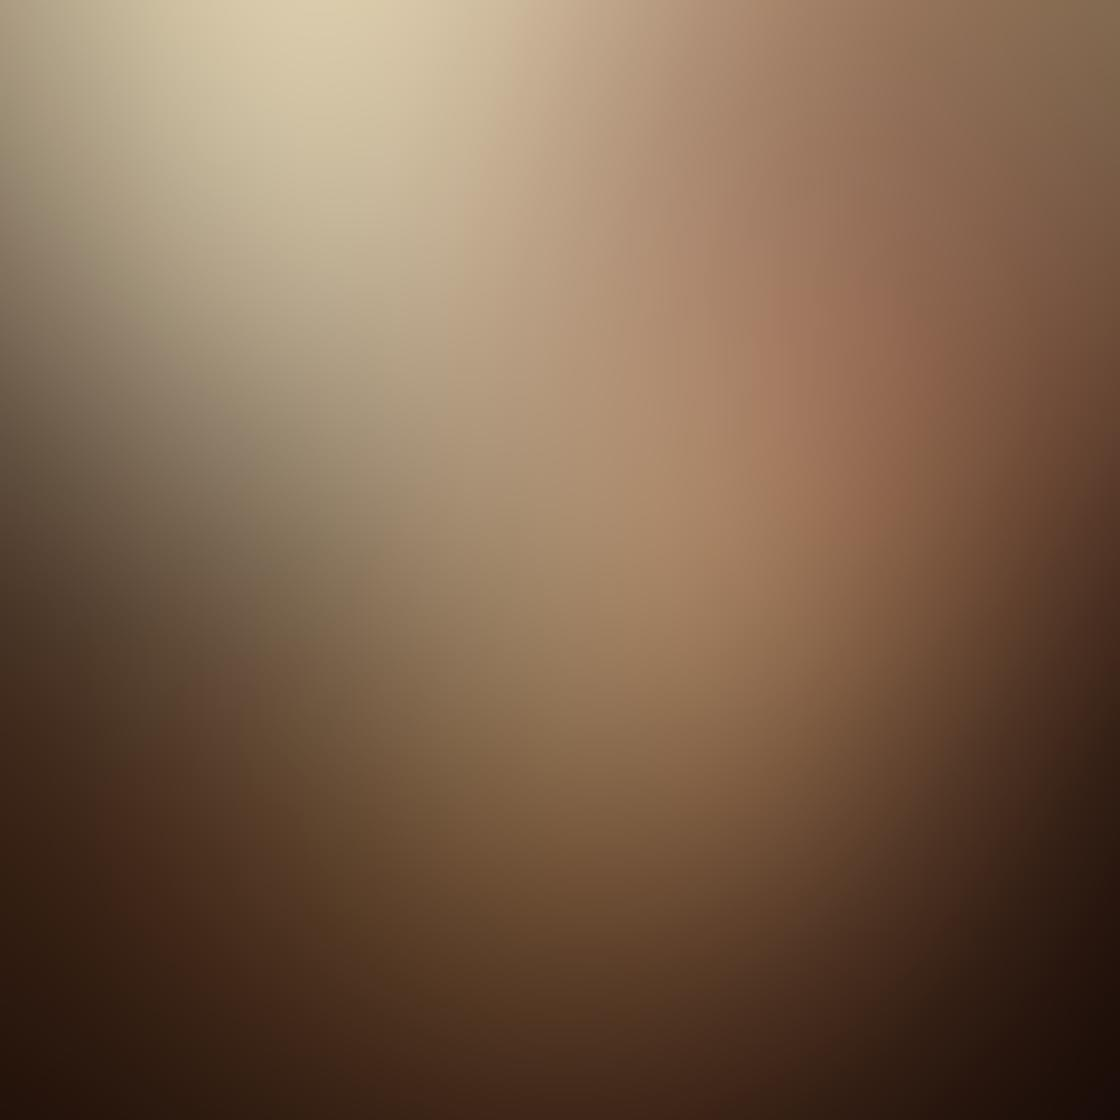 Cinematic iPhone Photos 24